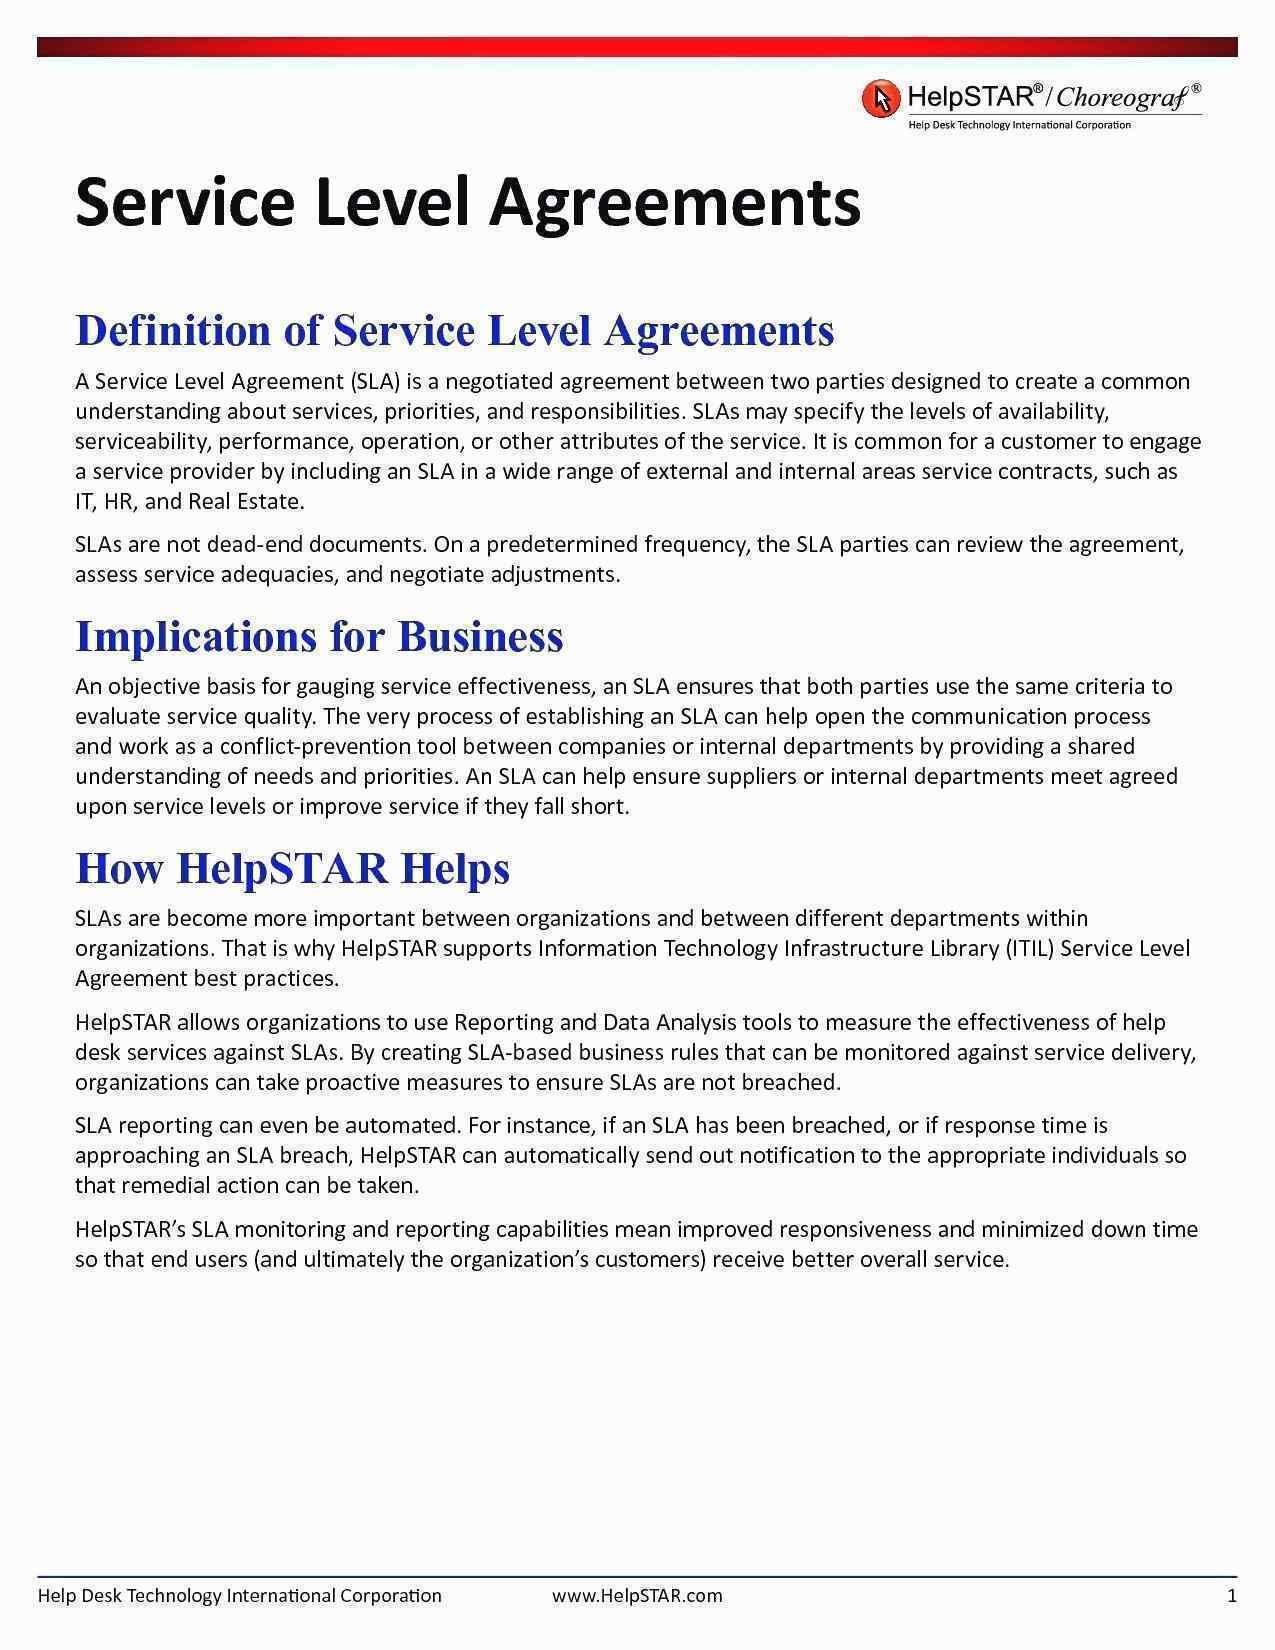 Help Desk Service Level Agreement Template